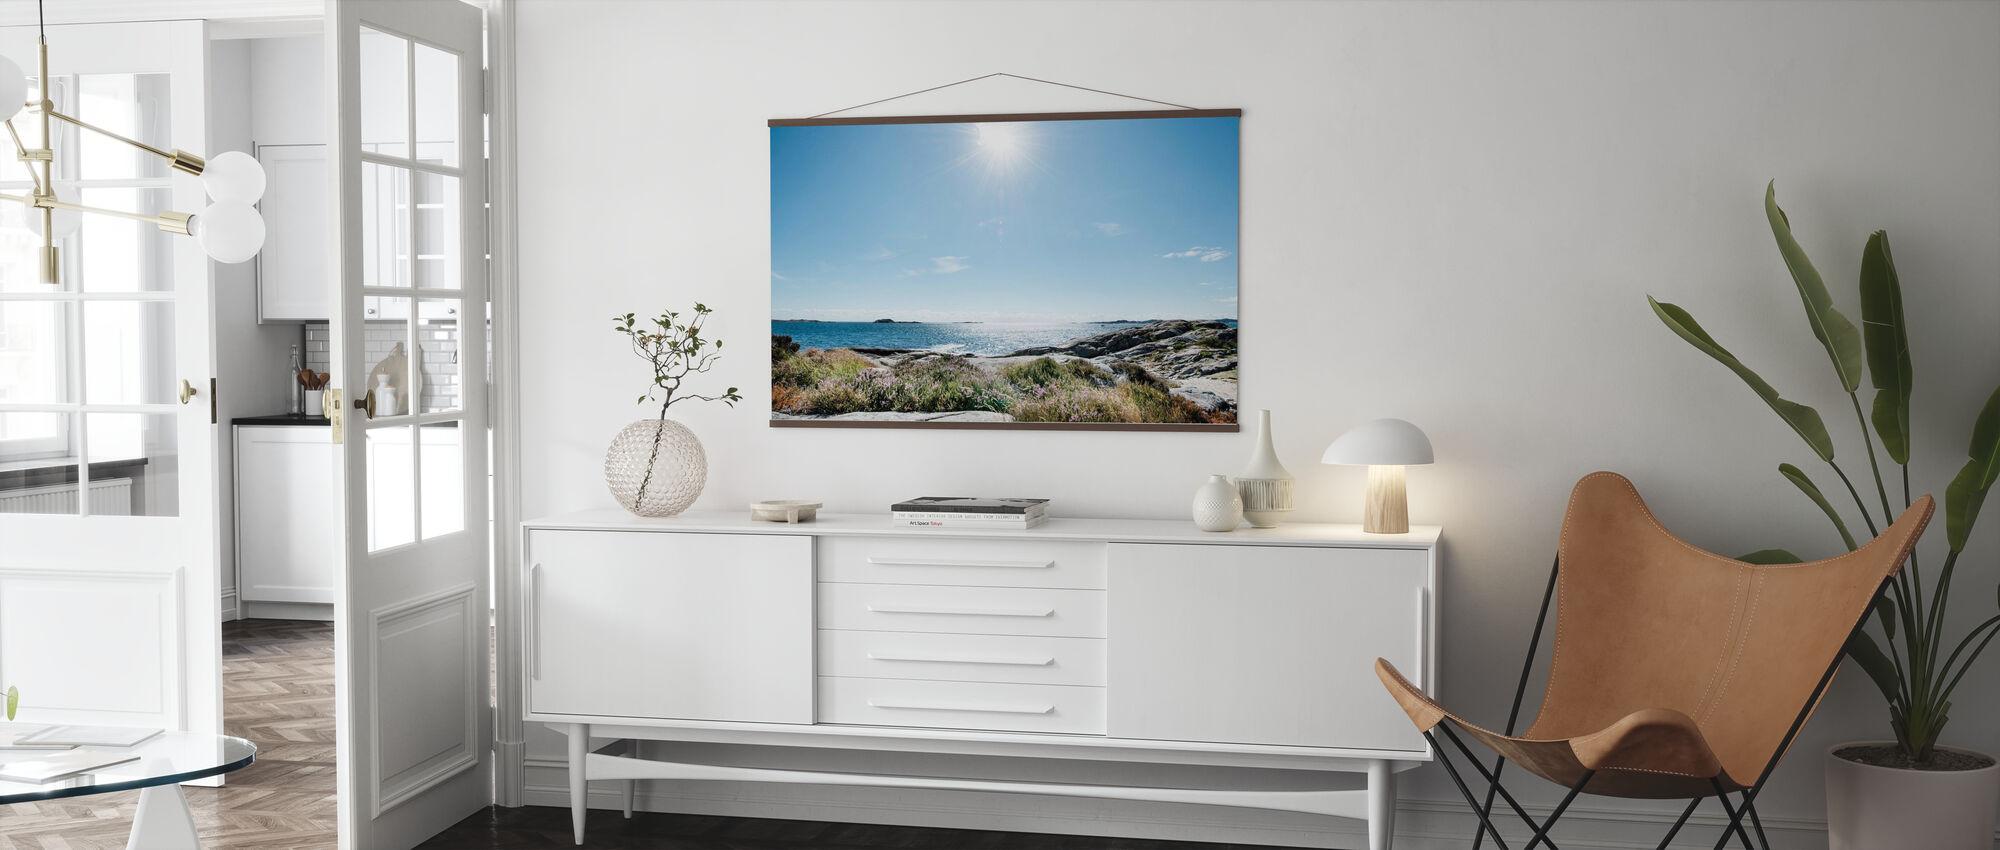 Havet i Bright Sunlight, Södra Norge - Poster - Vardagsrum